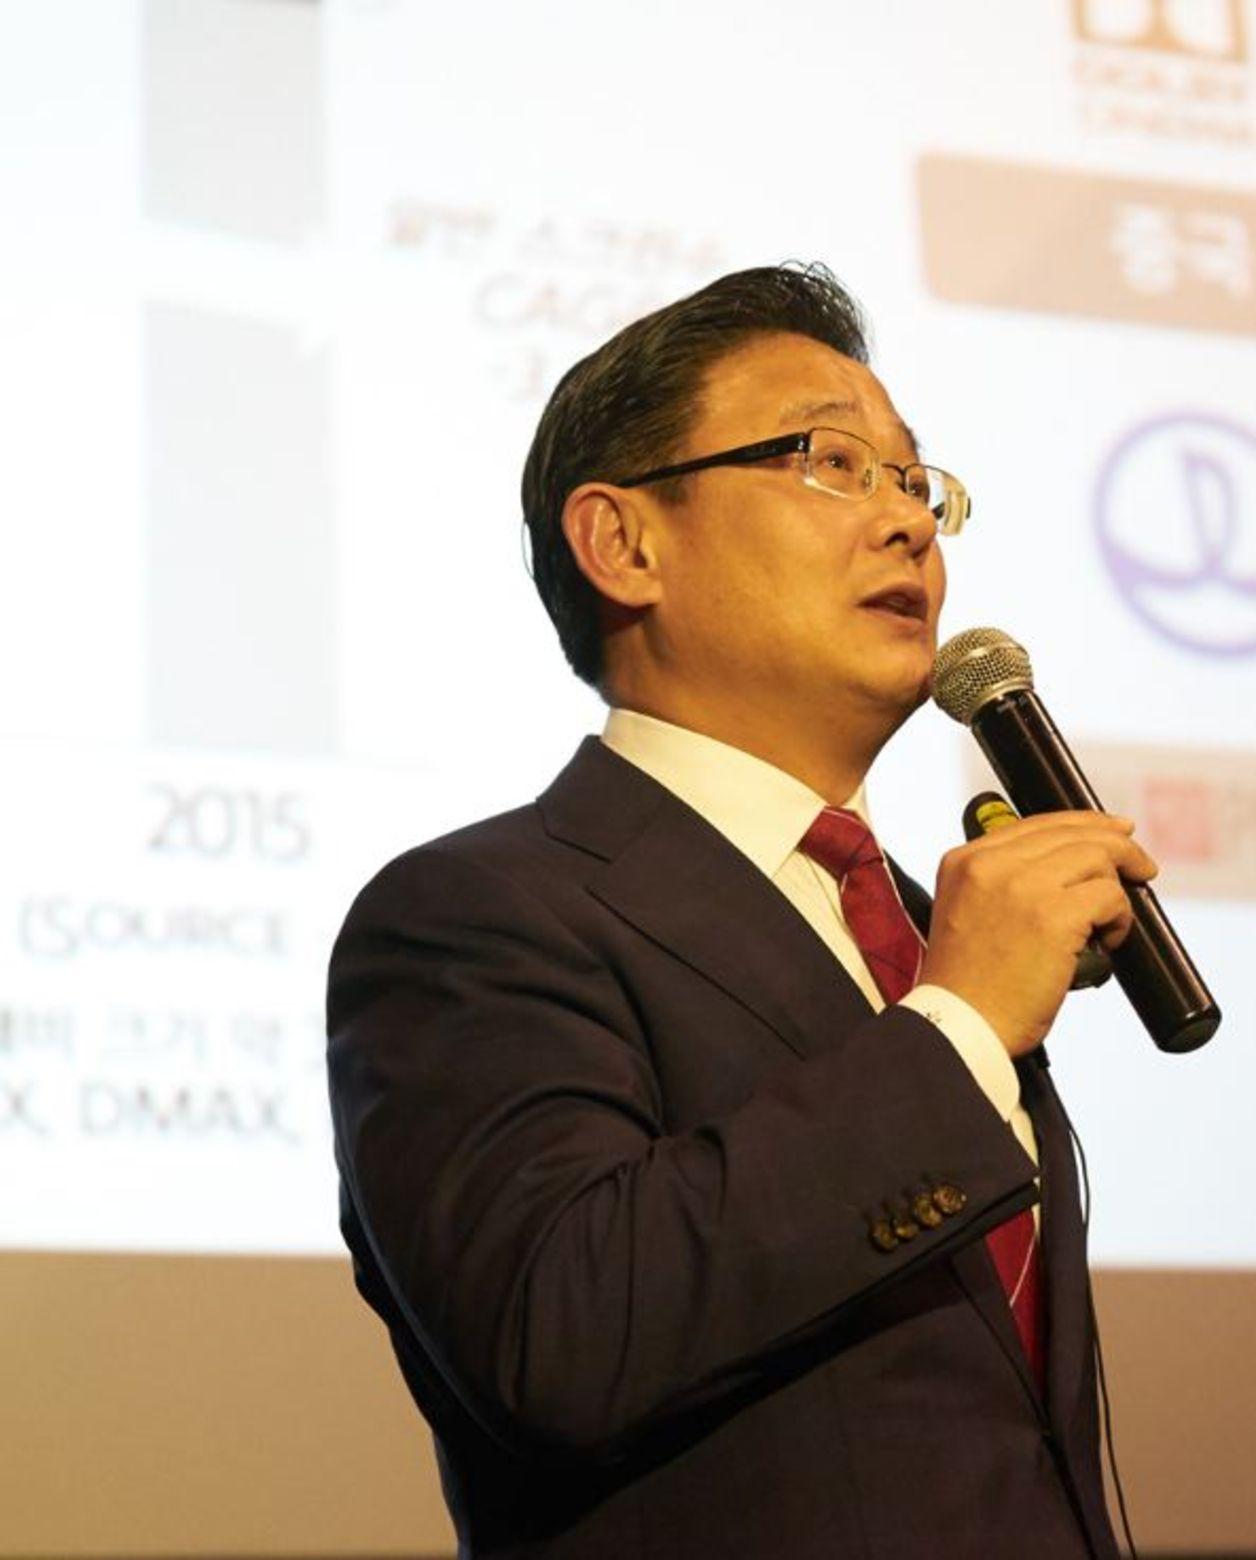 Choi Byung Hwan